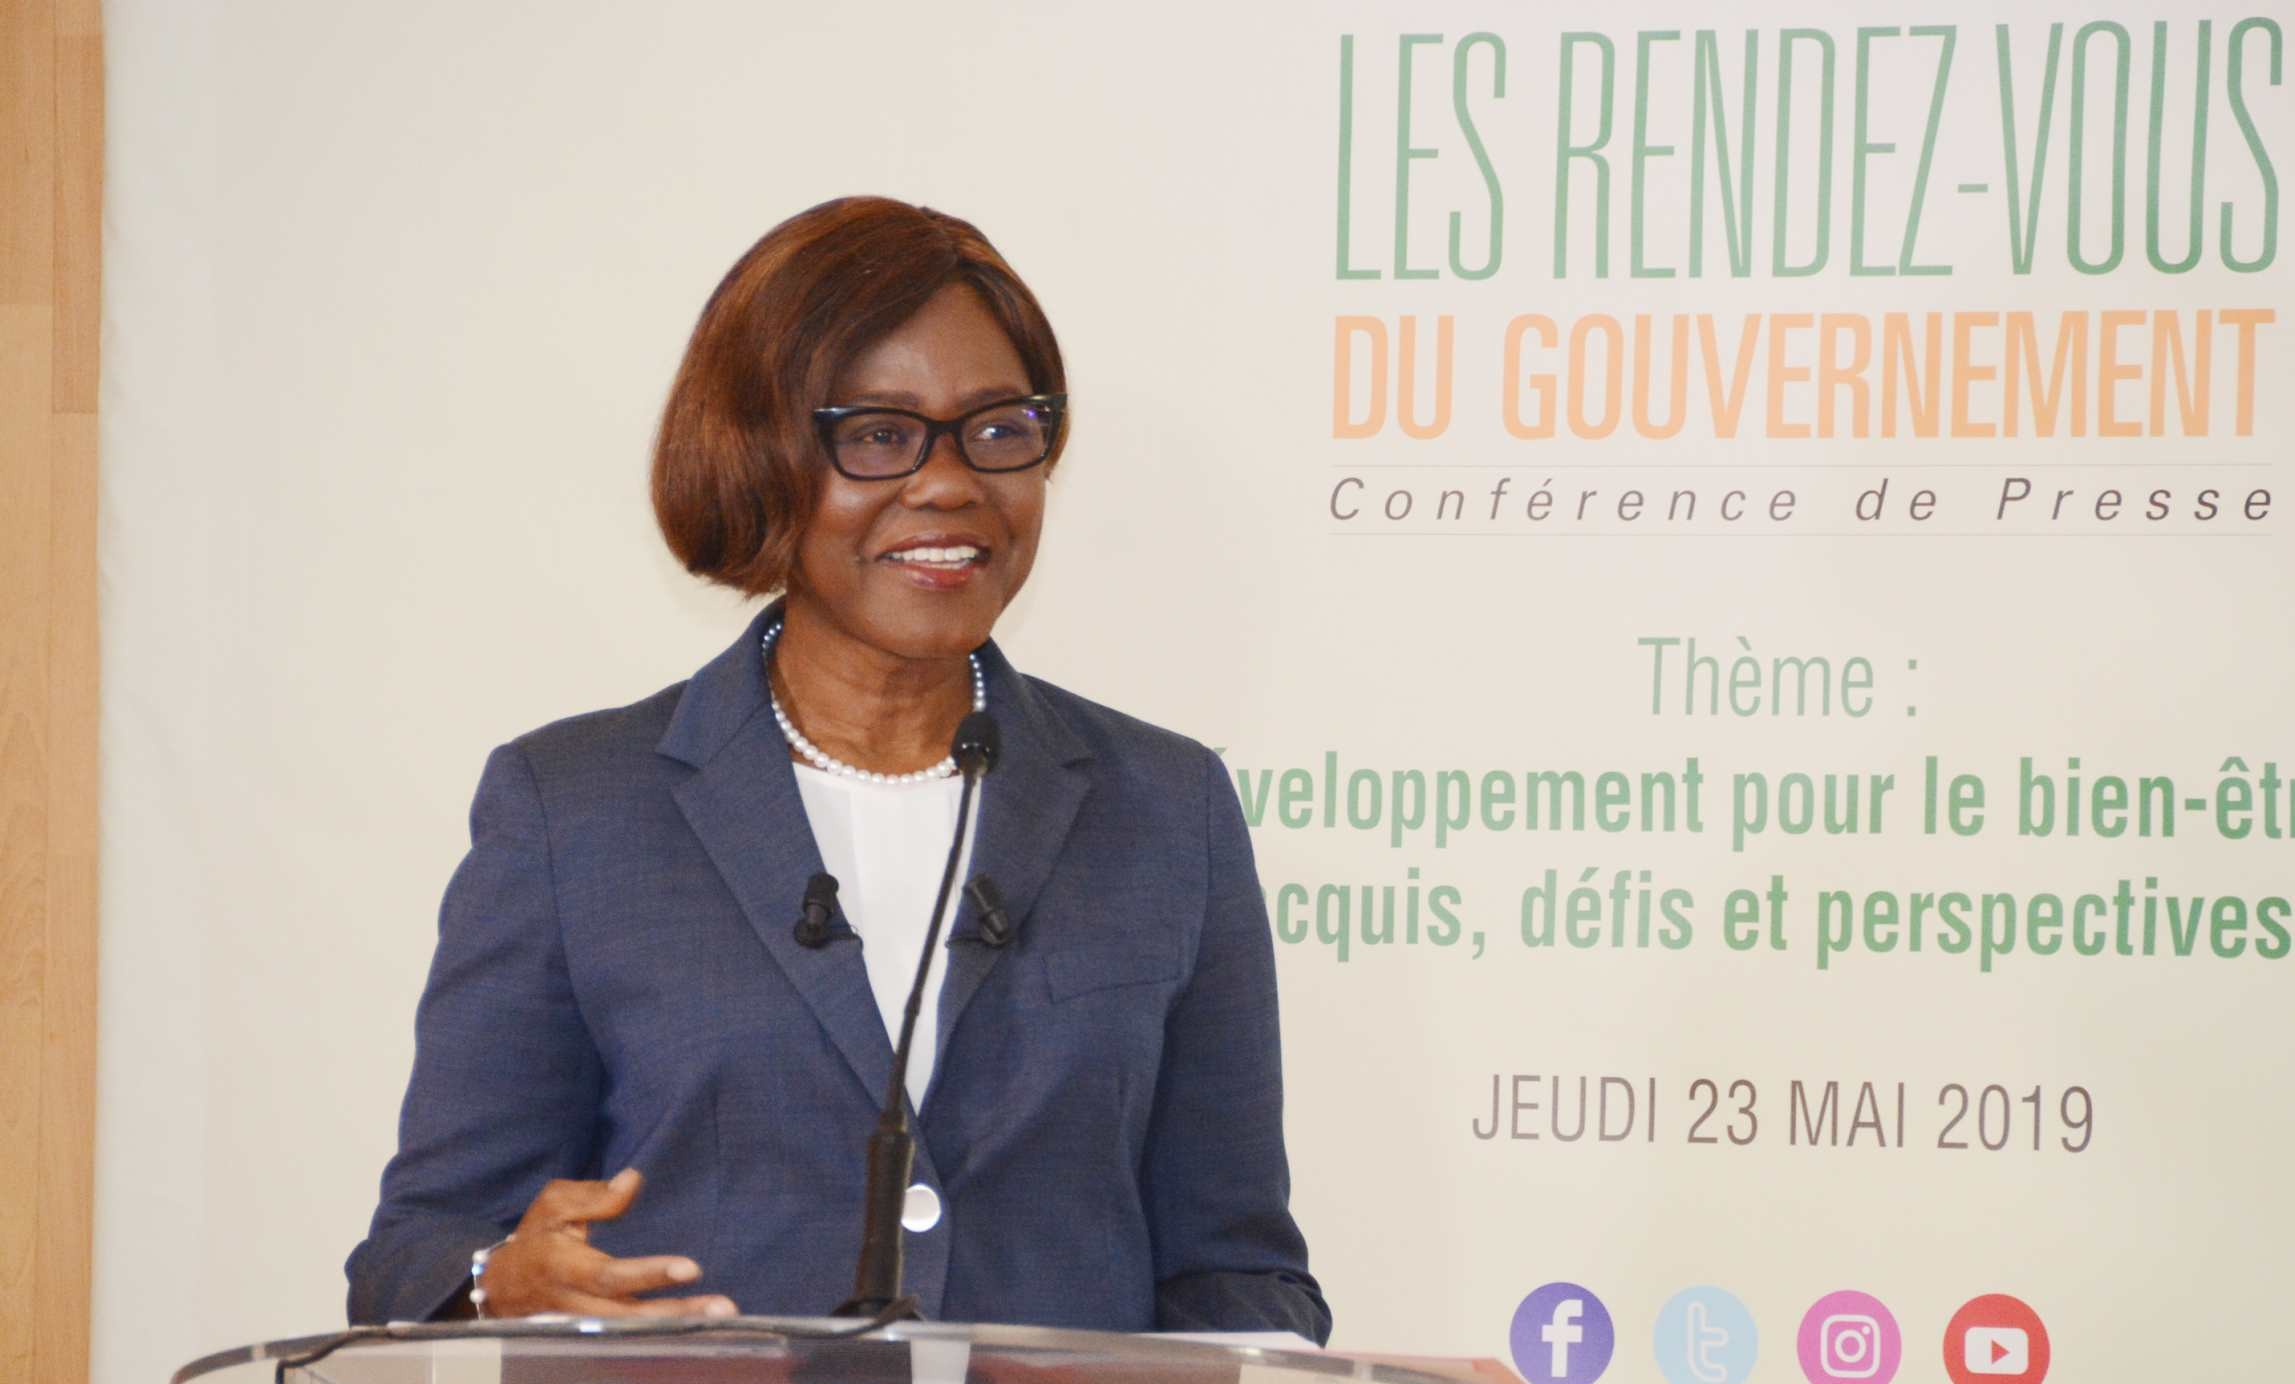 Rendez-vous du gouvernement,émergence,émergent,Nialé Kaba